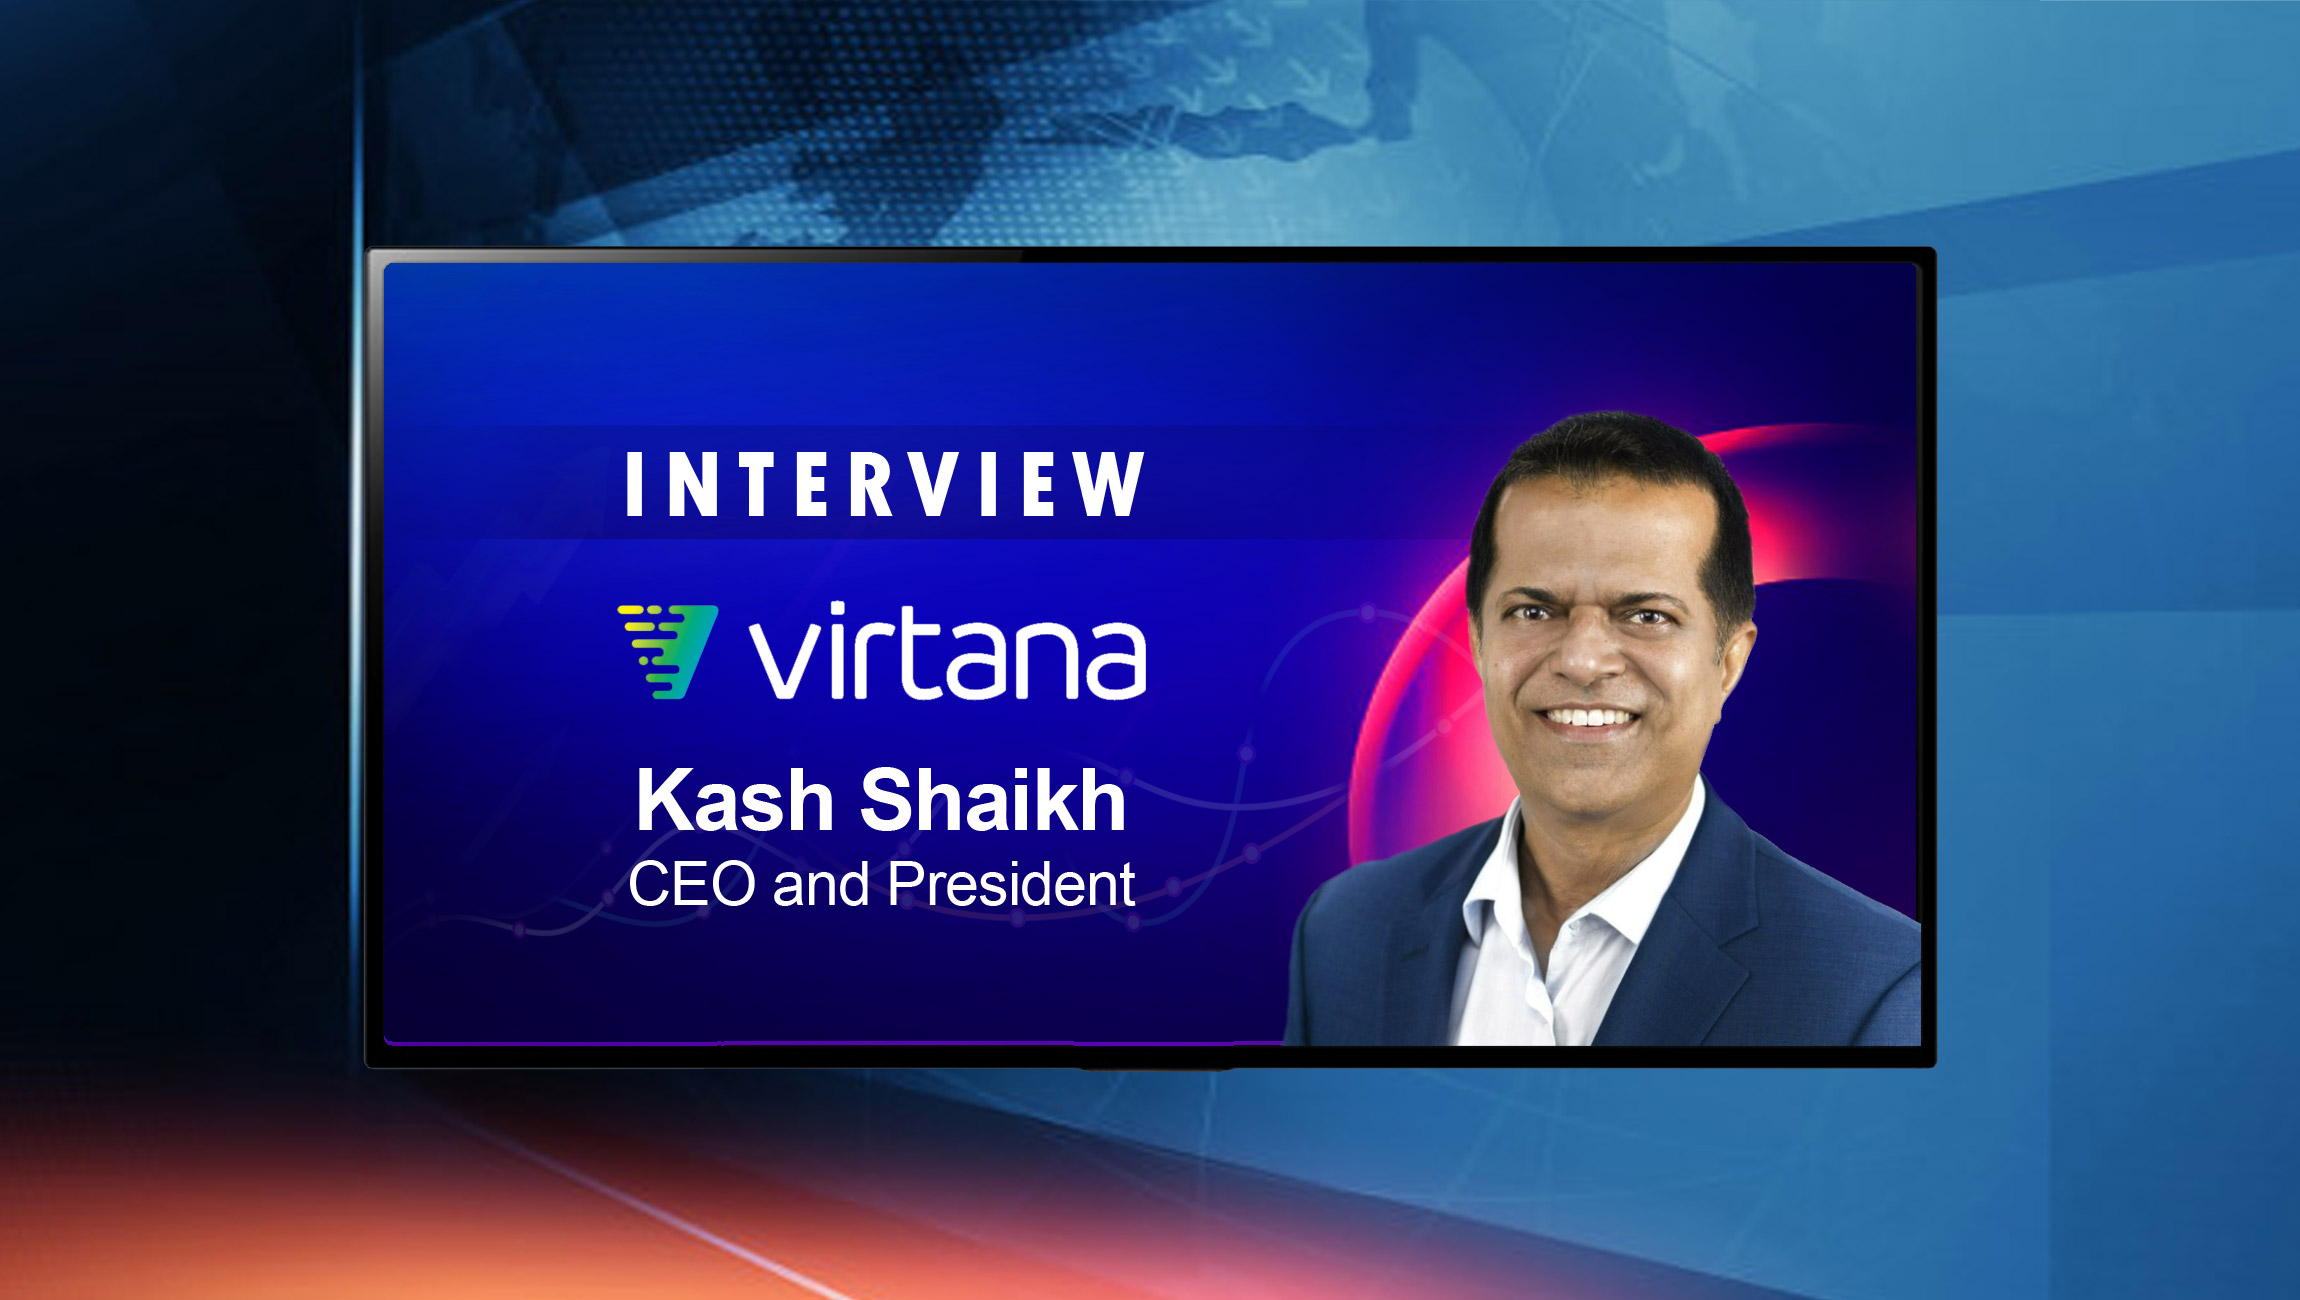 SalesTechStar Interview Kash Shaikh, CEO and President at Virtana